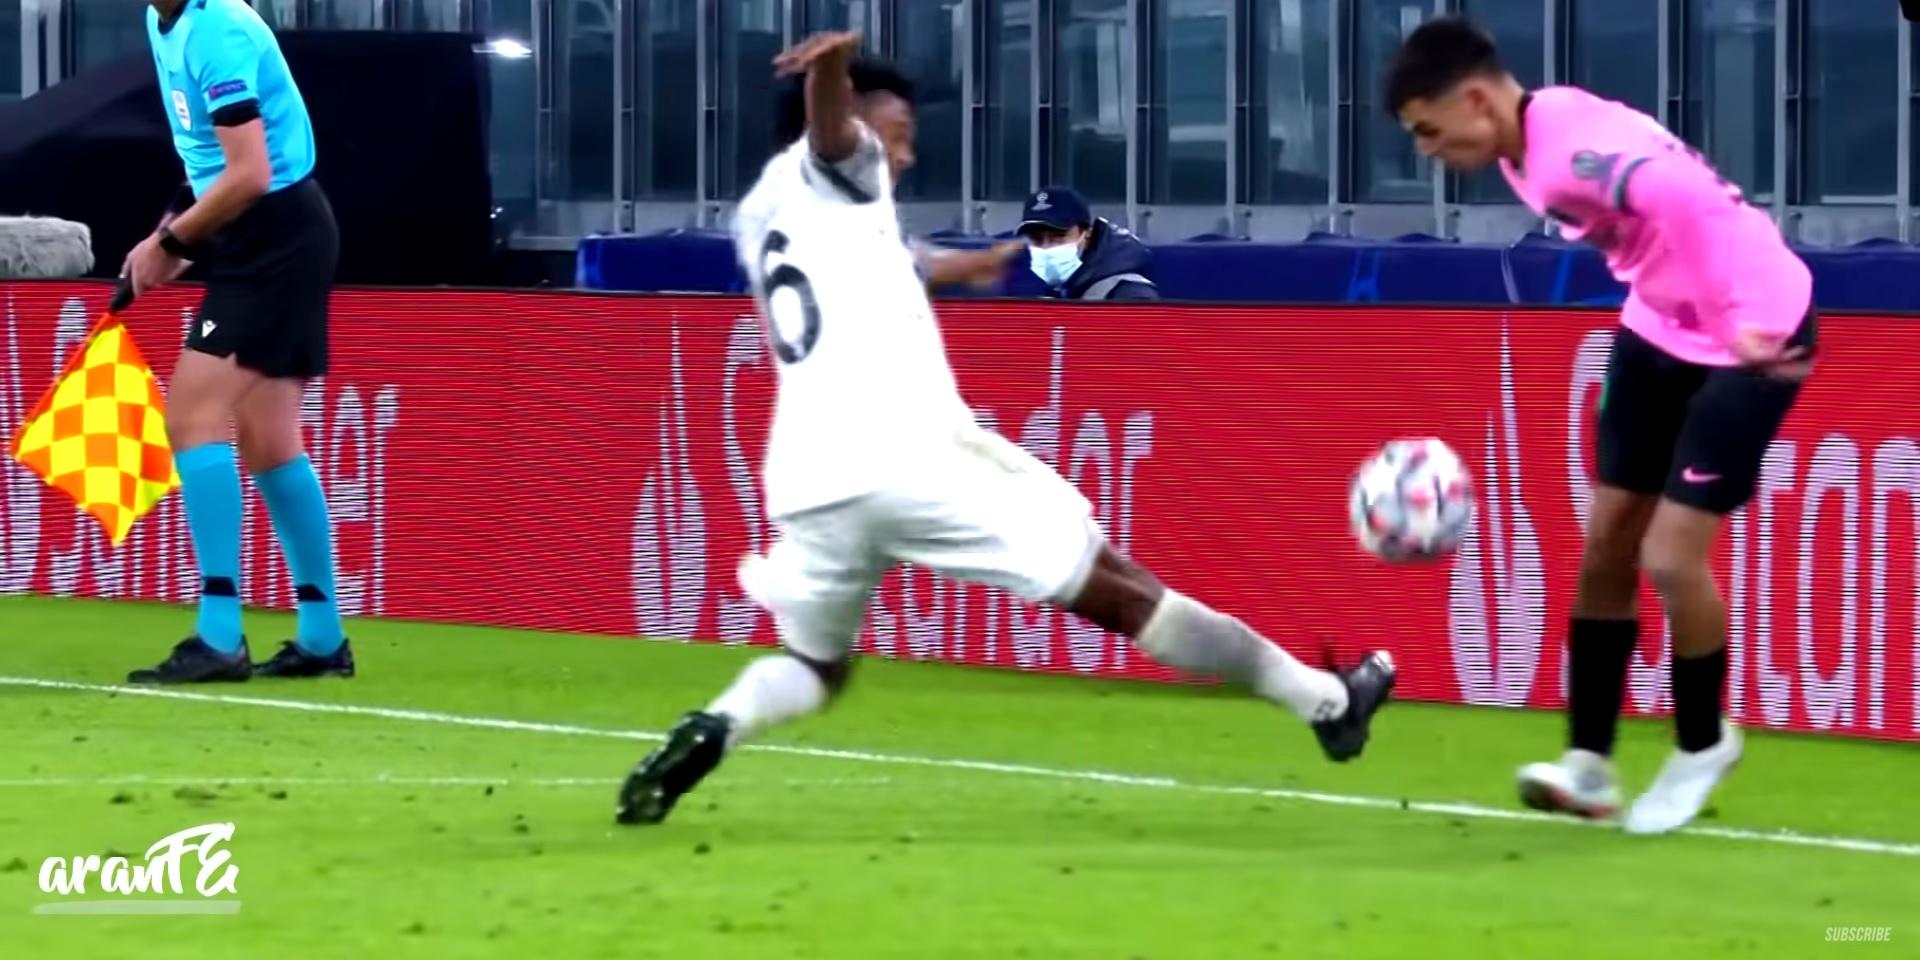 (Video) Pedri's best bits as Liverpool make move to sign Barcelona wonderkid